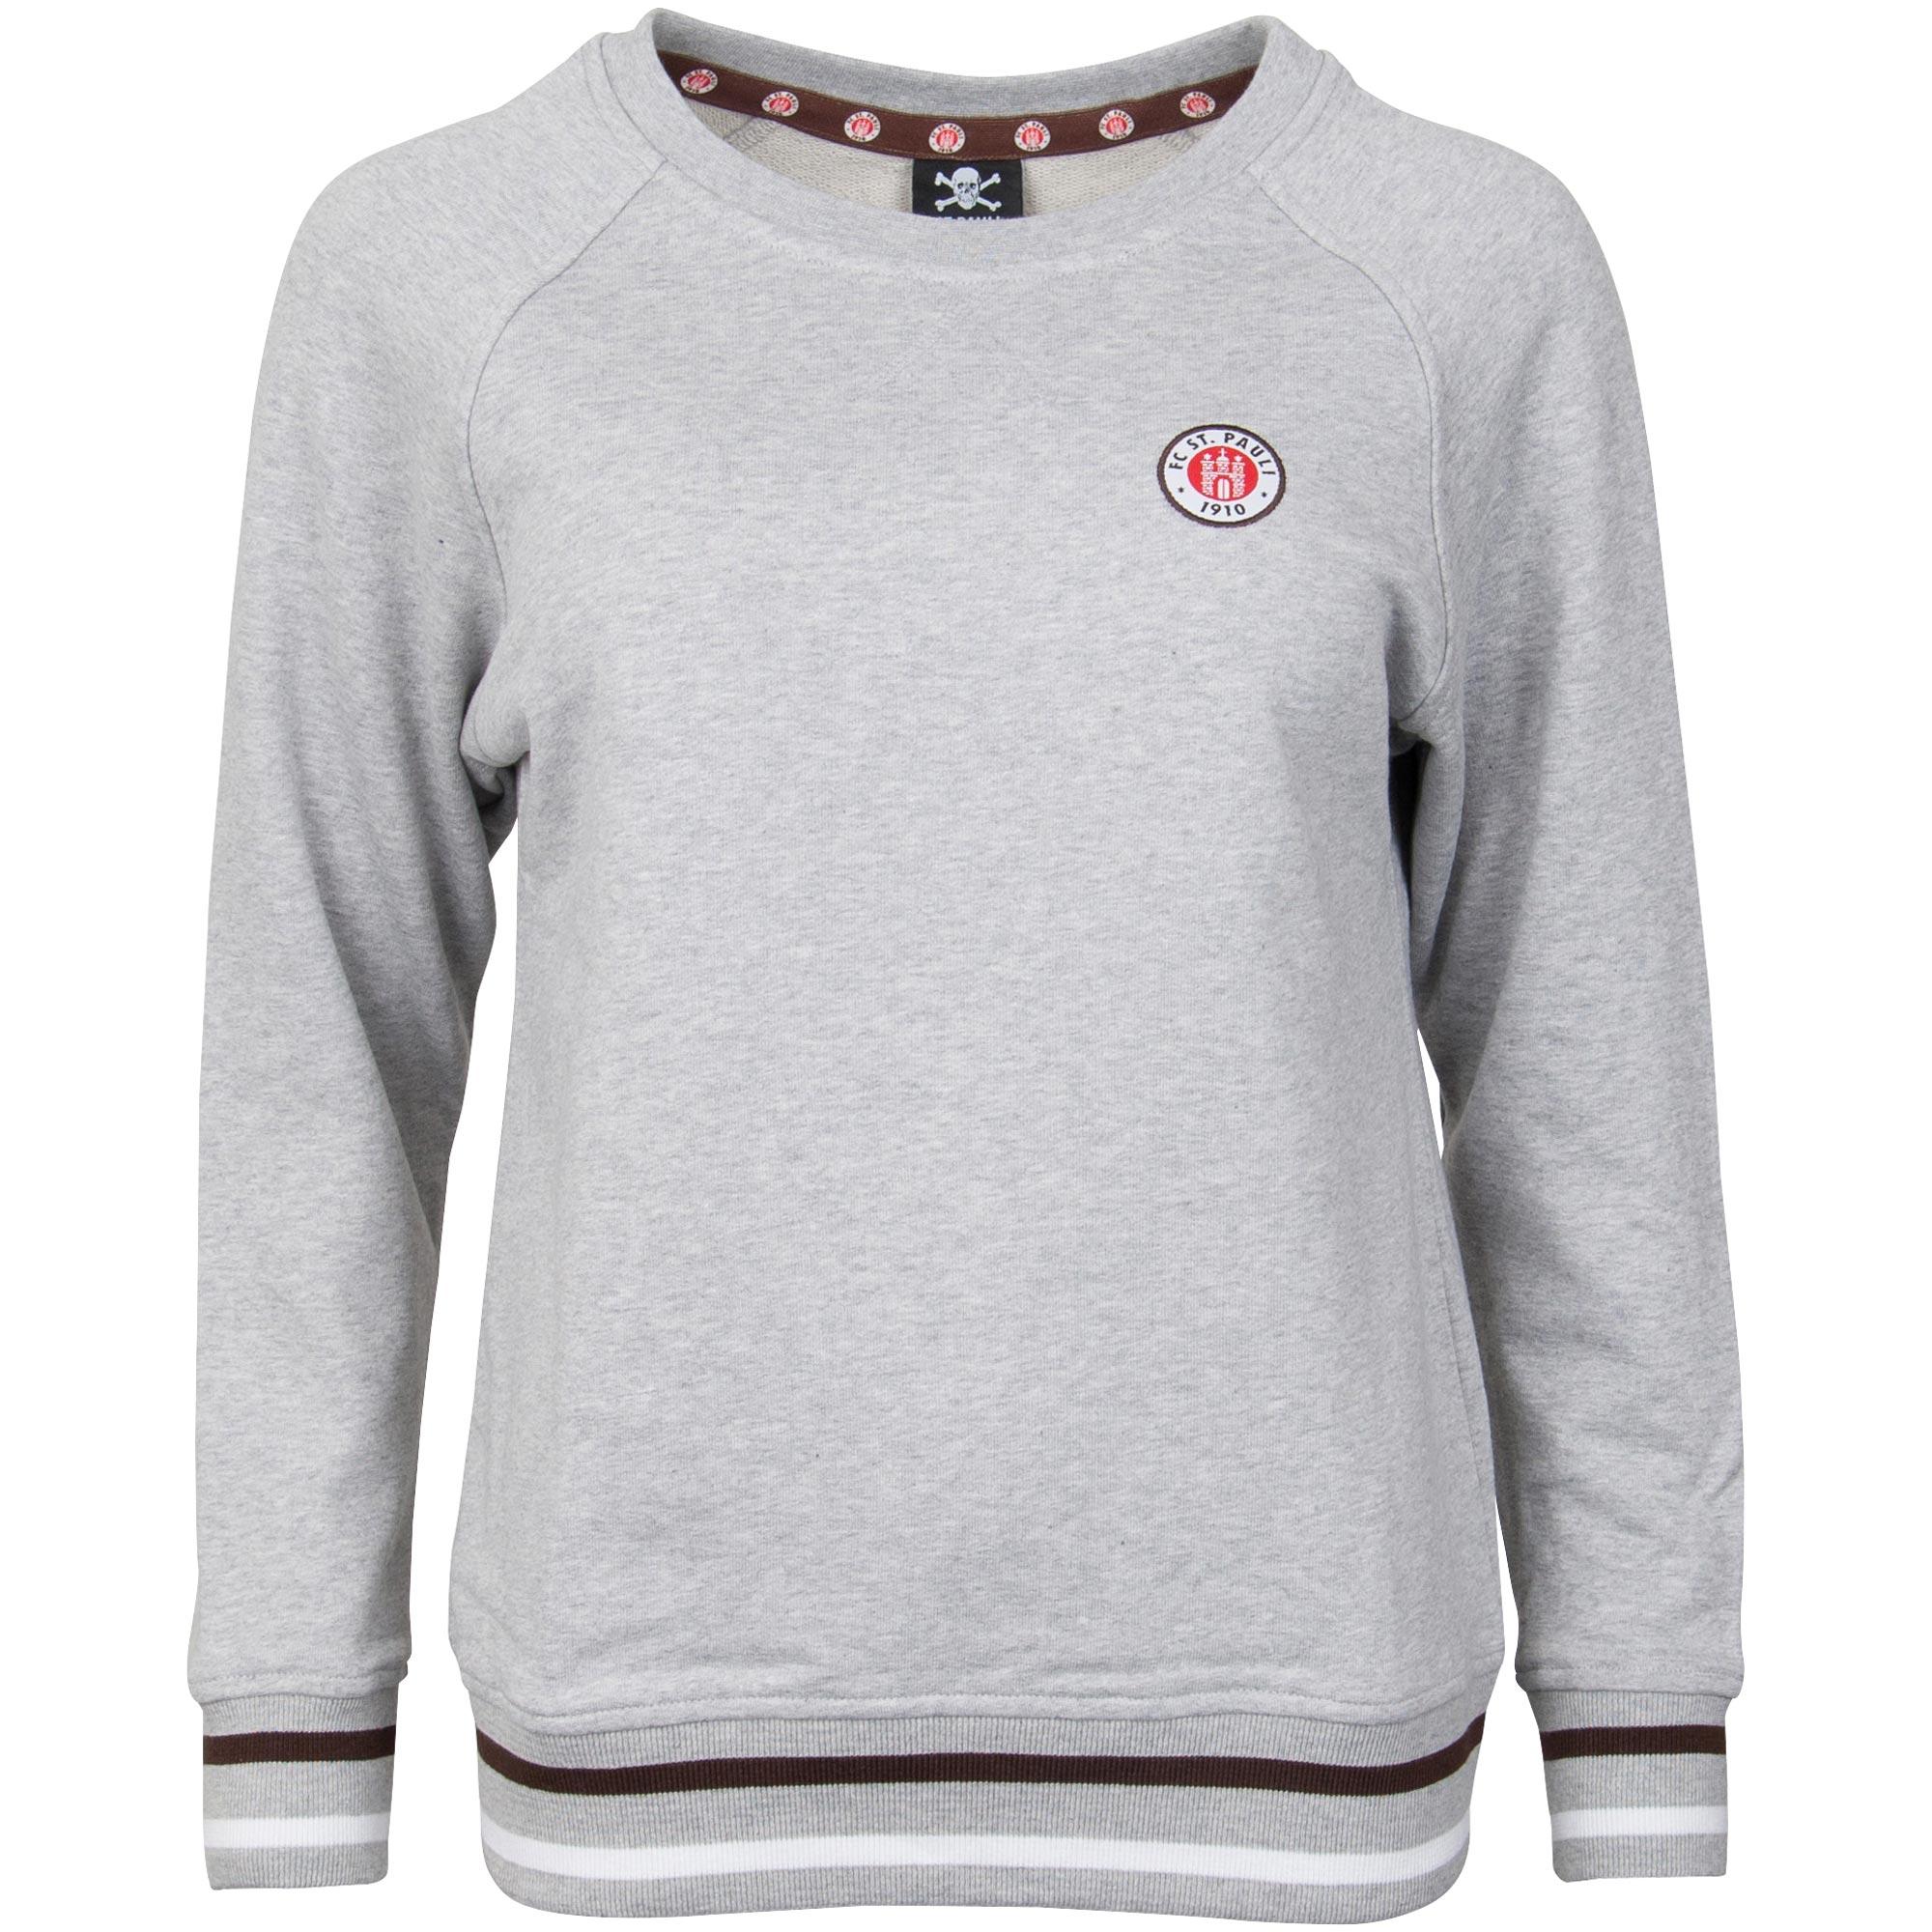 FC St. Pauli - Damen Sweatshirt Club mit Logo - grau